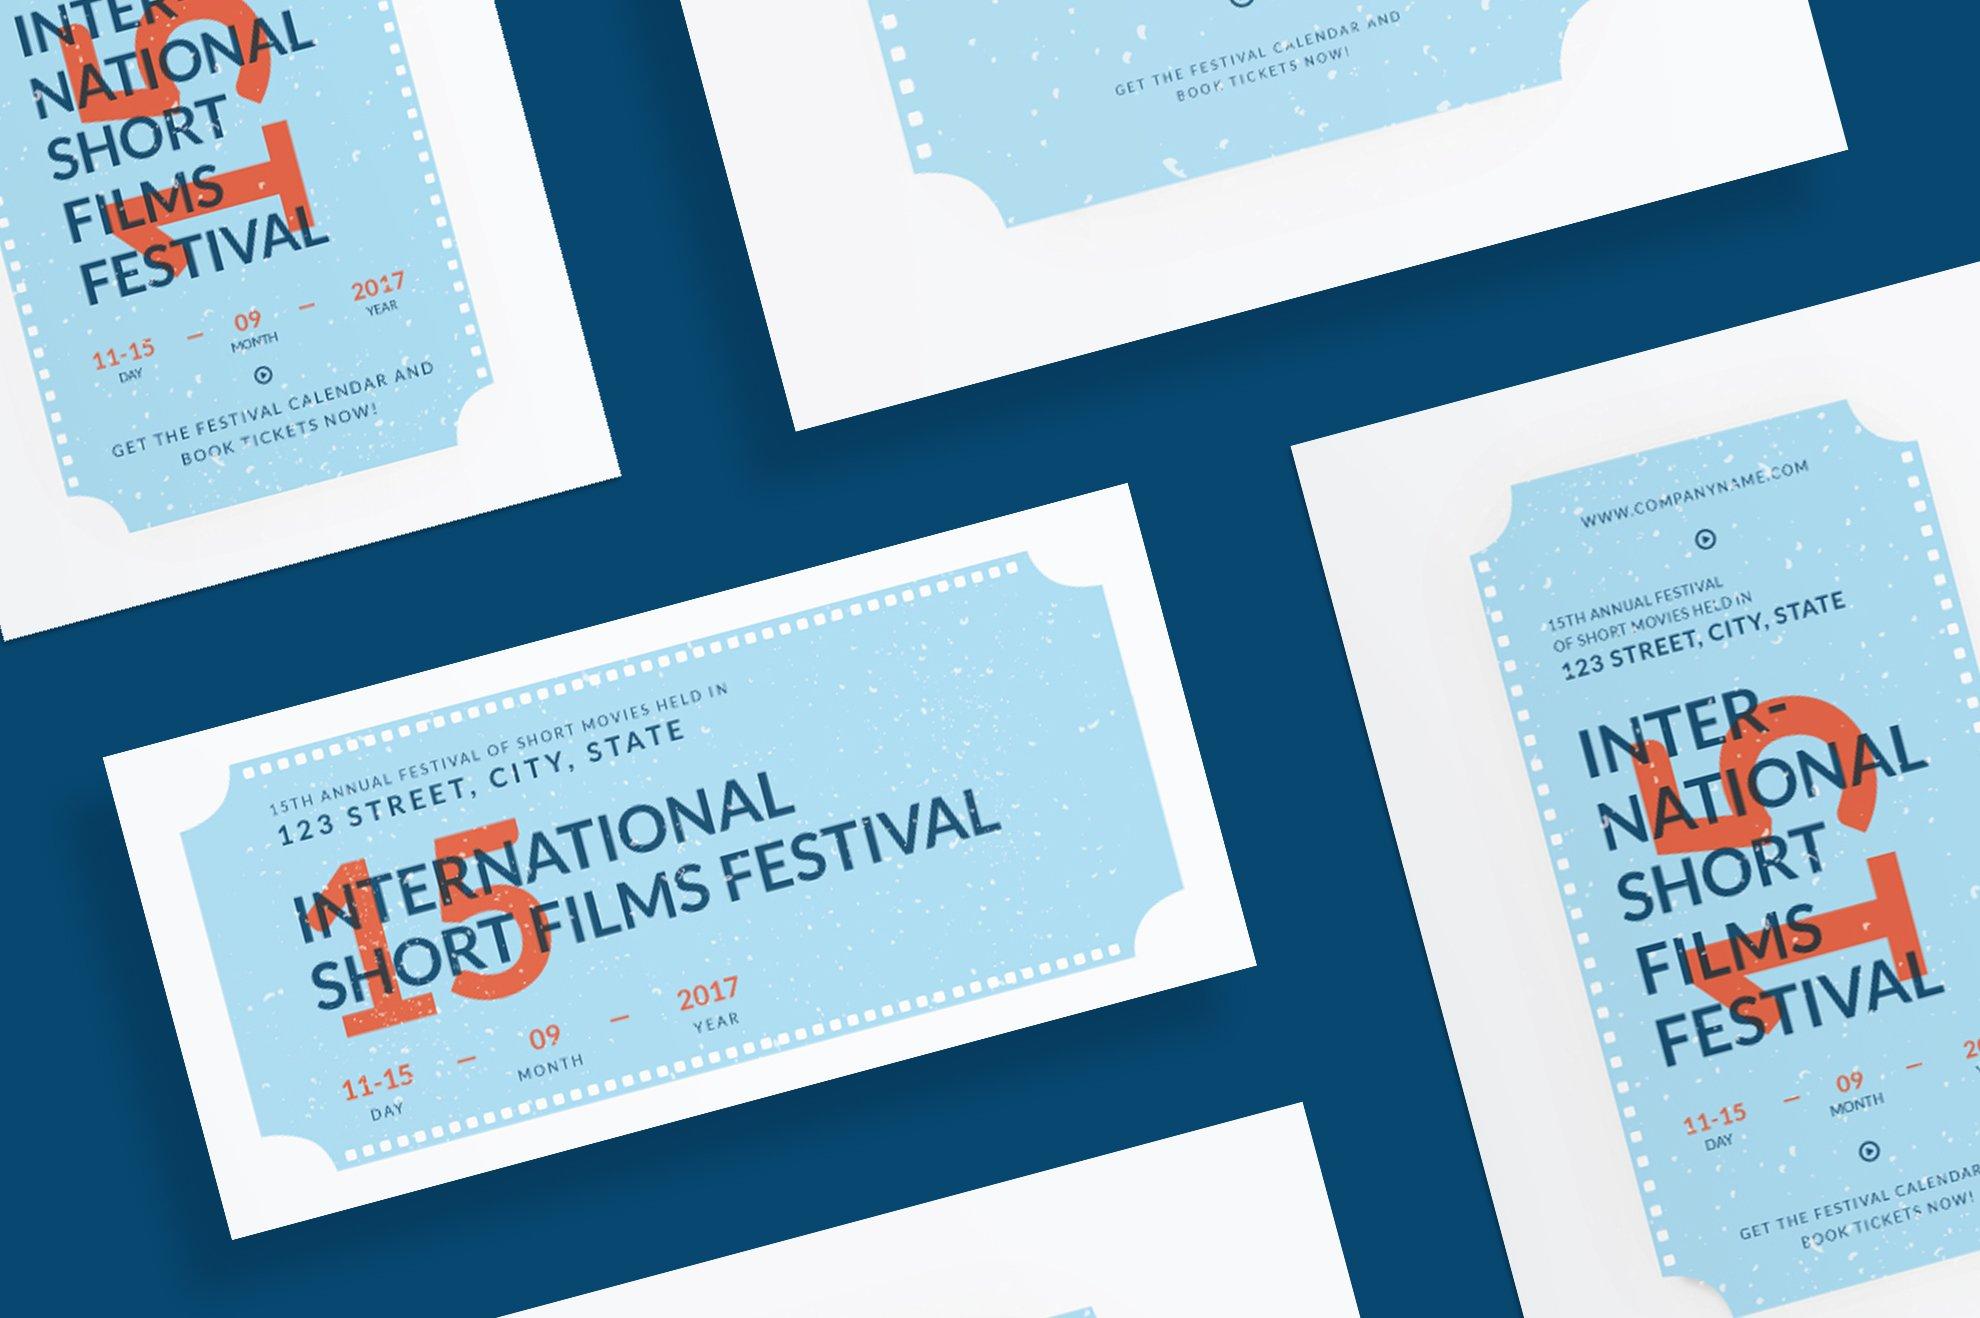 film festival brochure template - flyers film festival flyer templates creative market